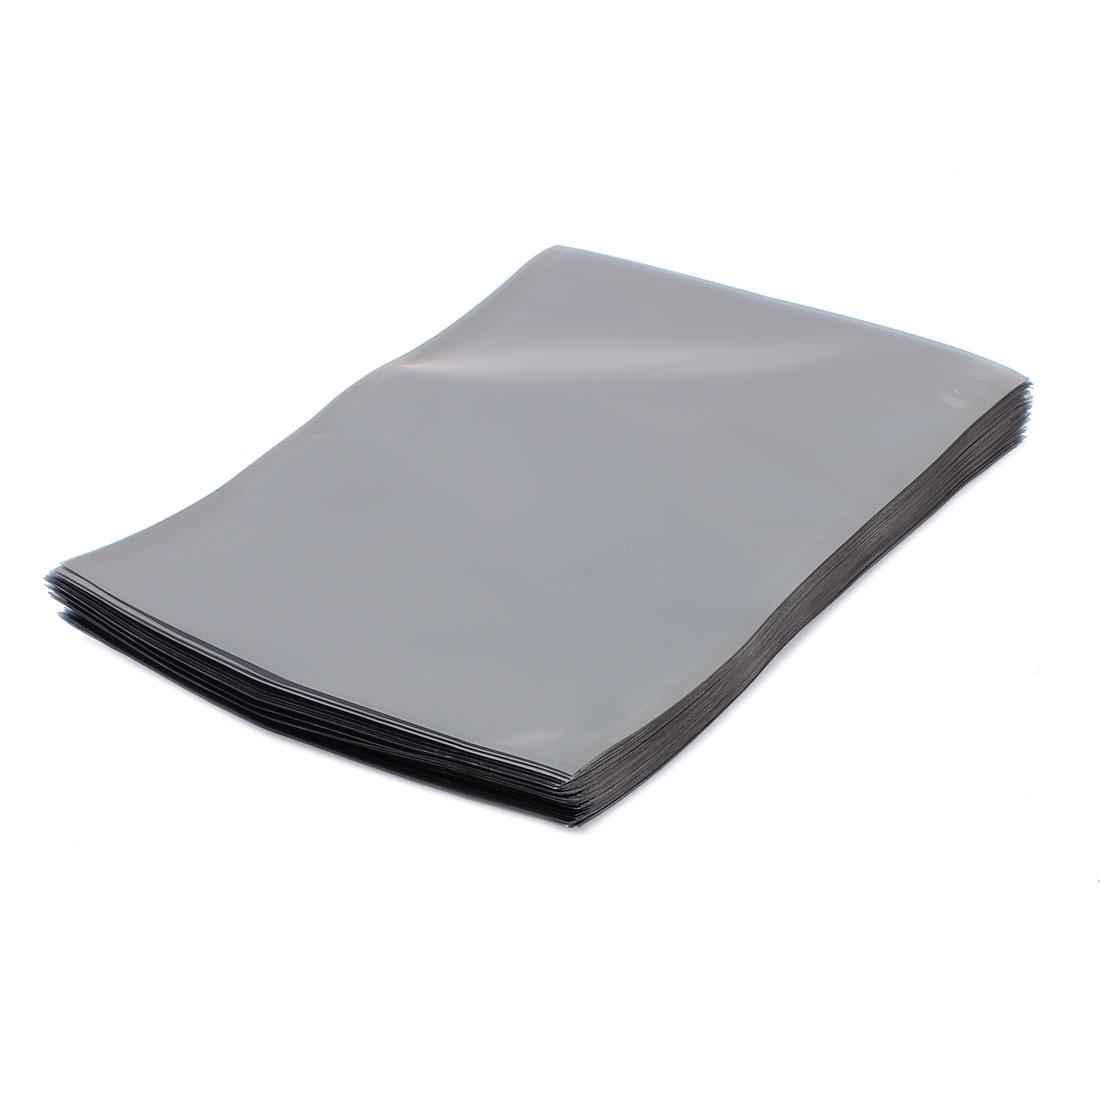 100 Pcs 150mm x 200mm Silver Tone Flat Open Top Anti Static Bag For Electronics